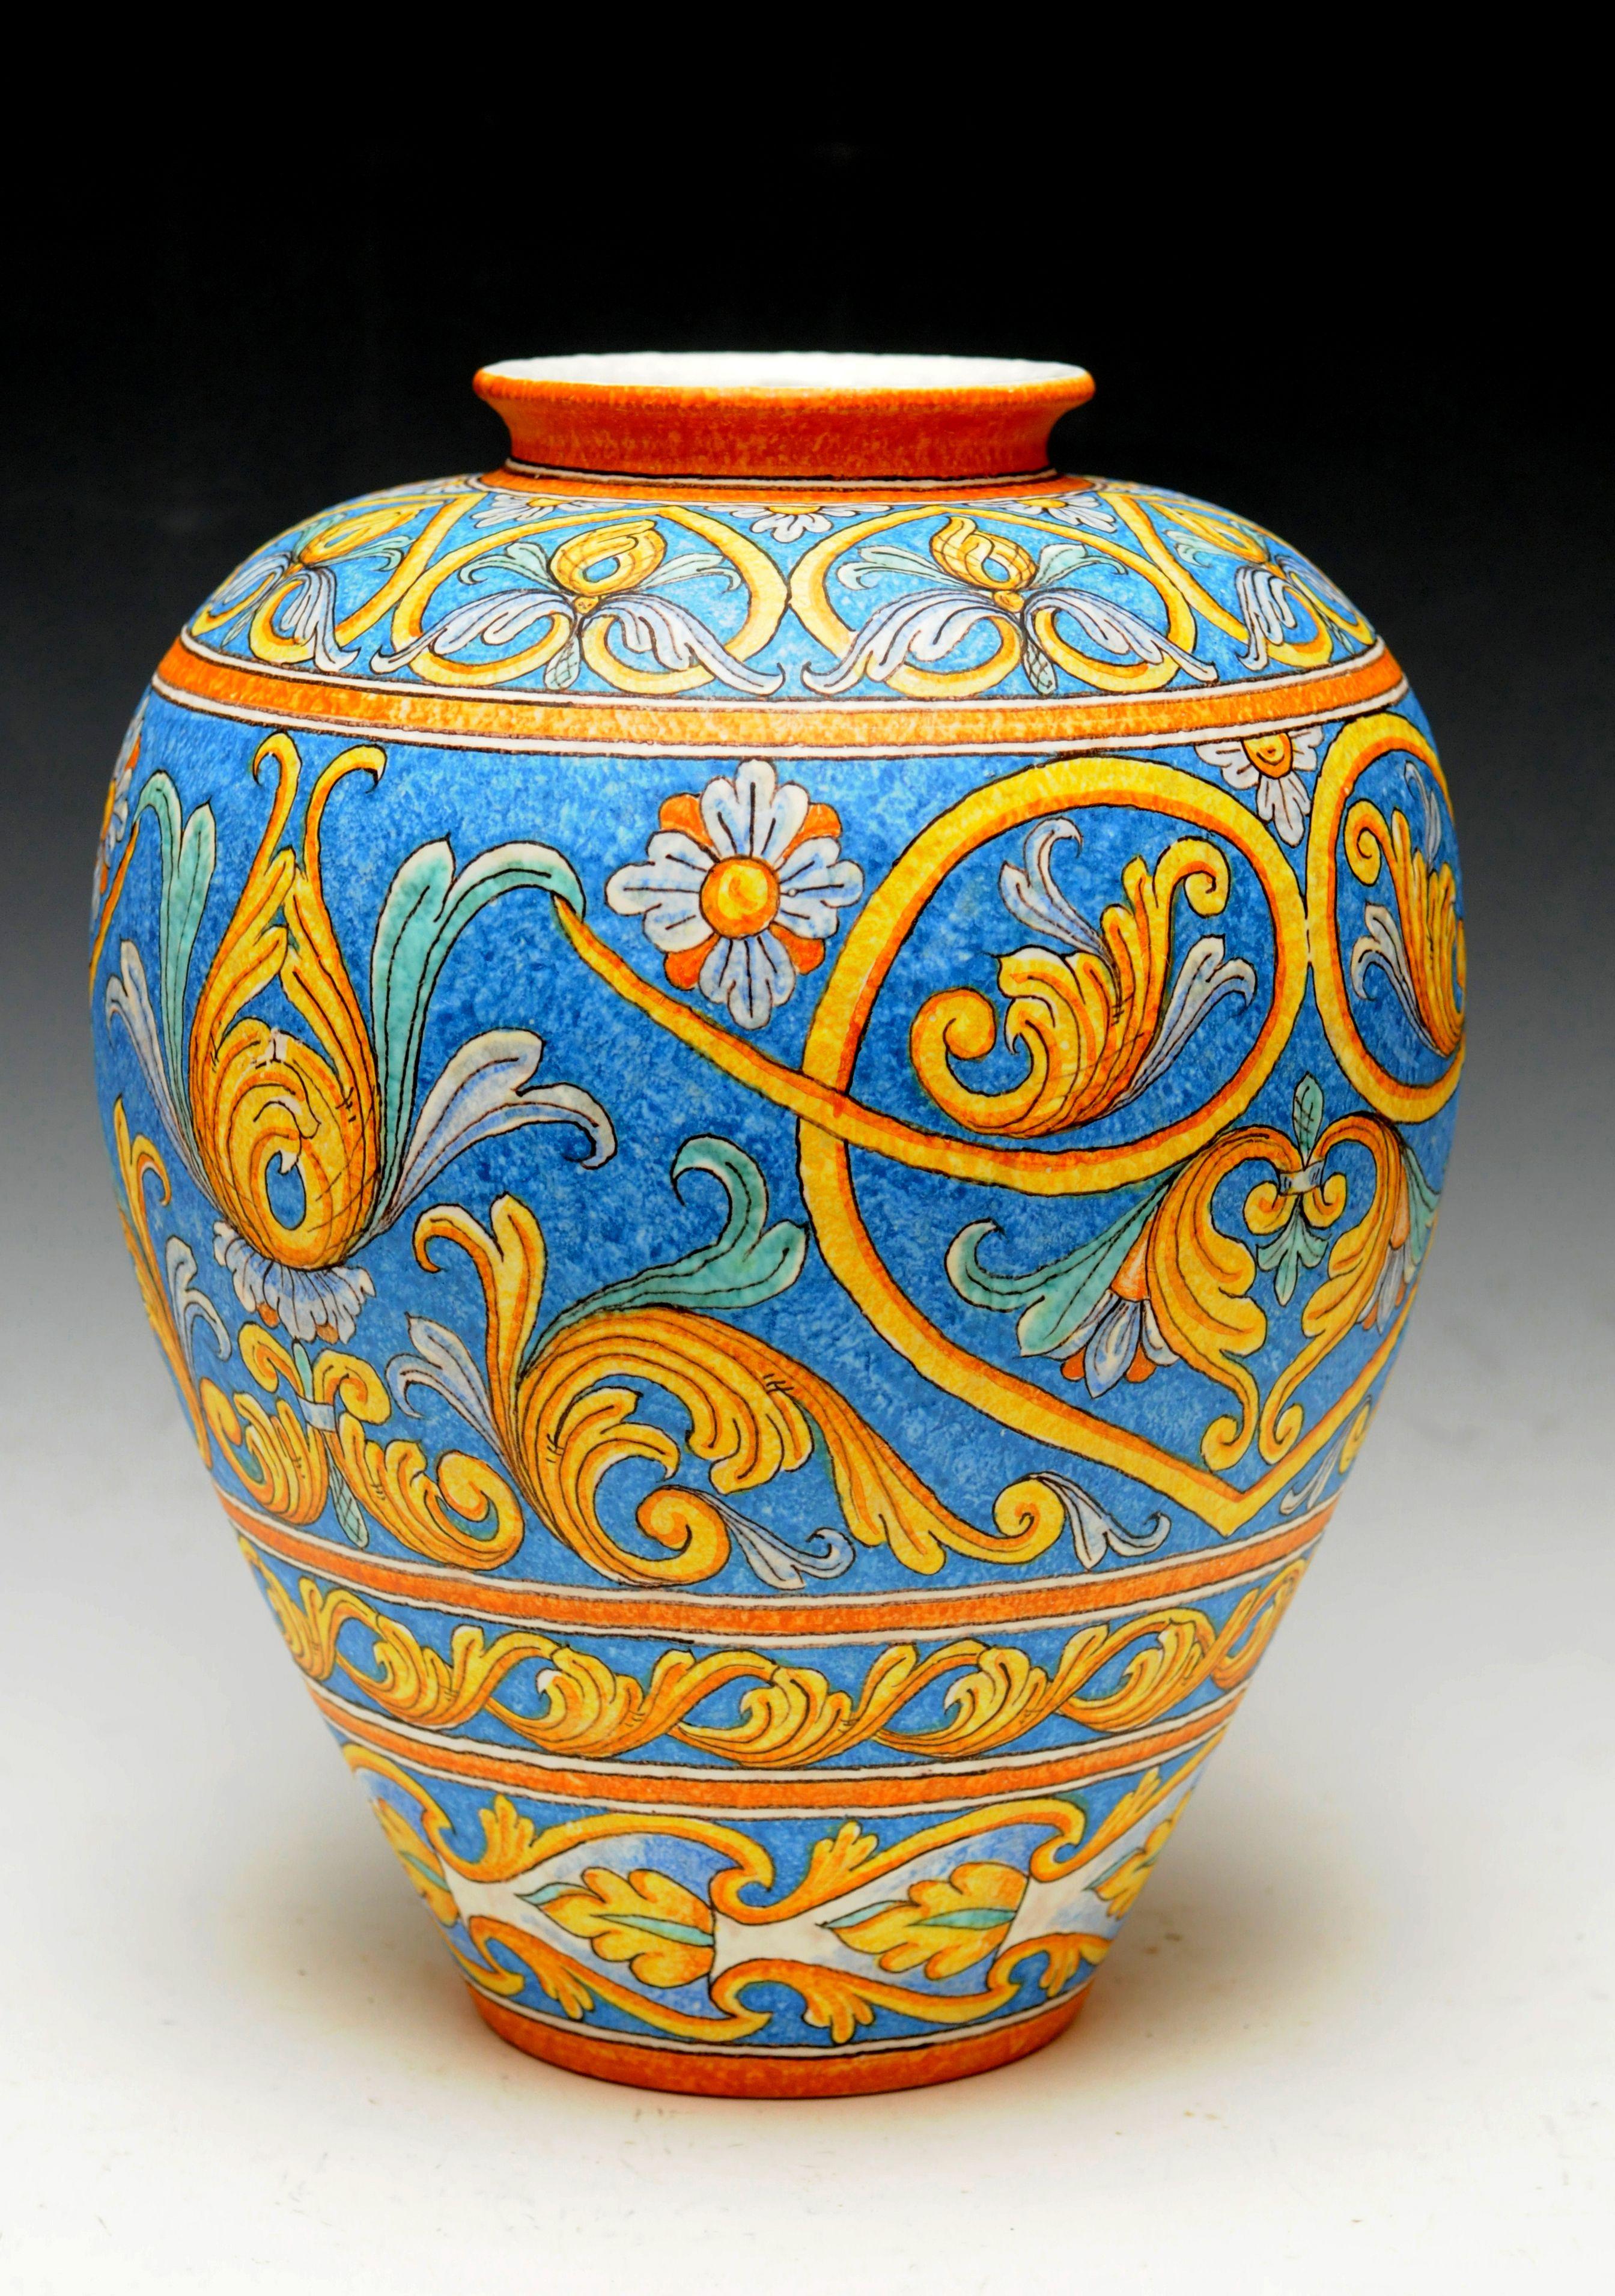 Italian Ceramics Handmade Vaso Cm 35 Con Superficie A Buccia D Arancia Arte Della Ceramica Ceramica Dipinta A Mano Ceramica